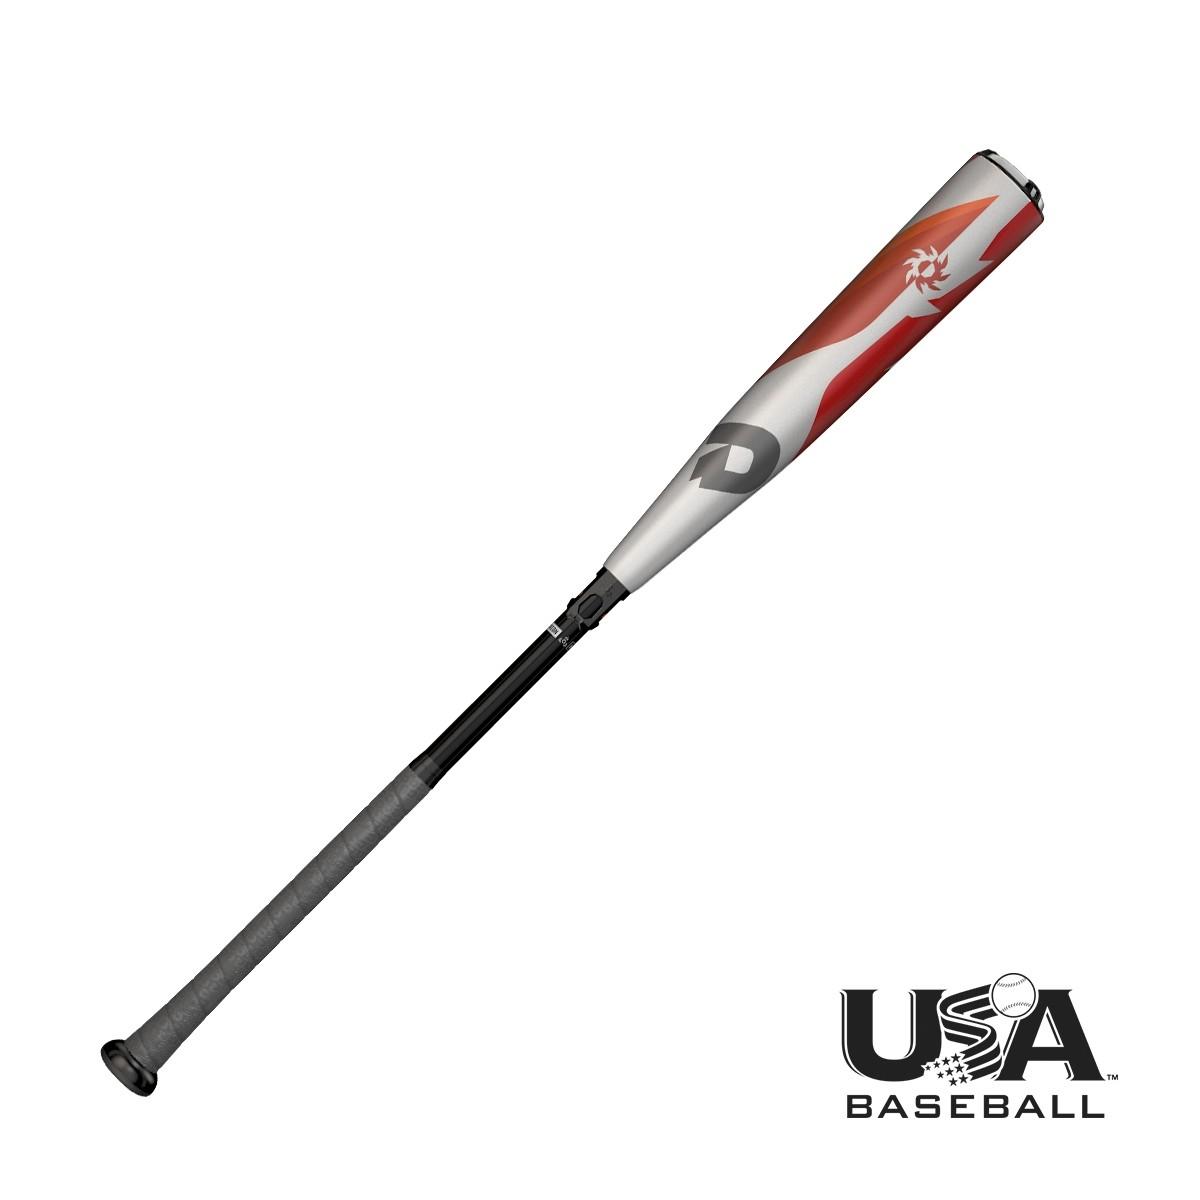 demarini-voodoo-10-2018-usa-balanced-2-5-8-baseball-bat-30-inch-20-oz WTDXUD22030-18 DeMarini 887768610647 Following along with the new usa baseball standards the newest line